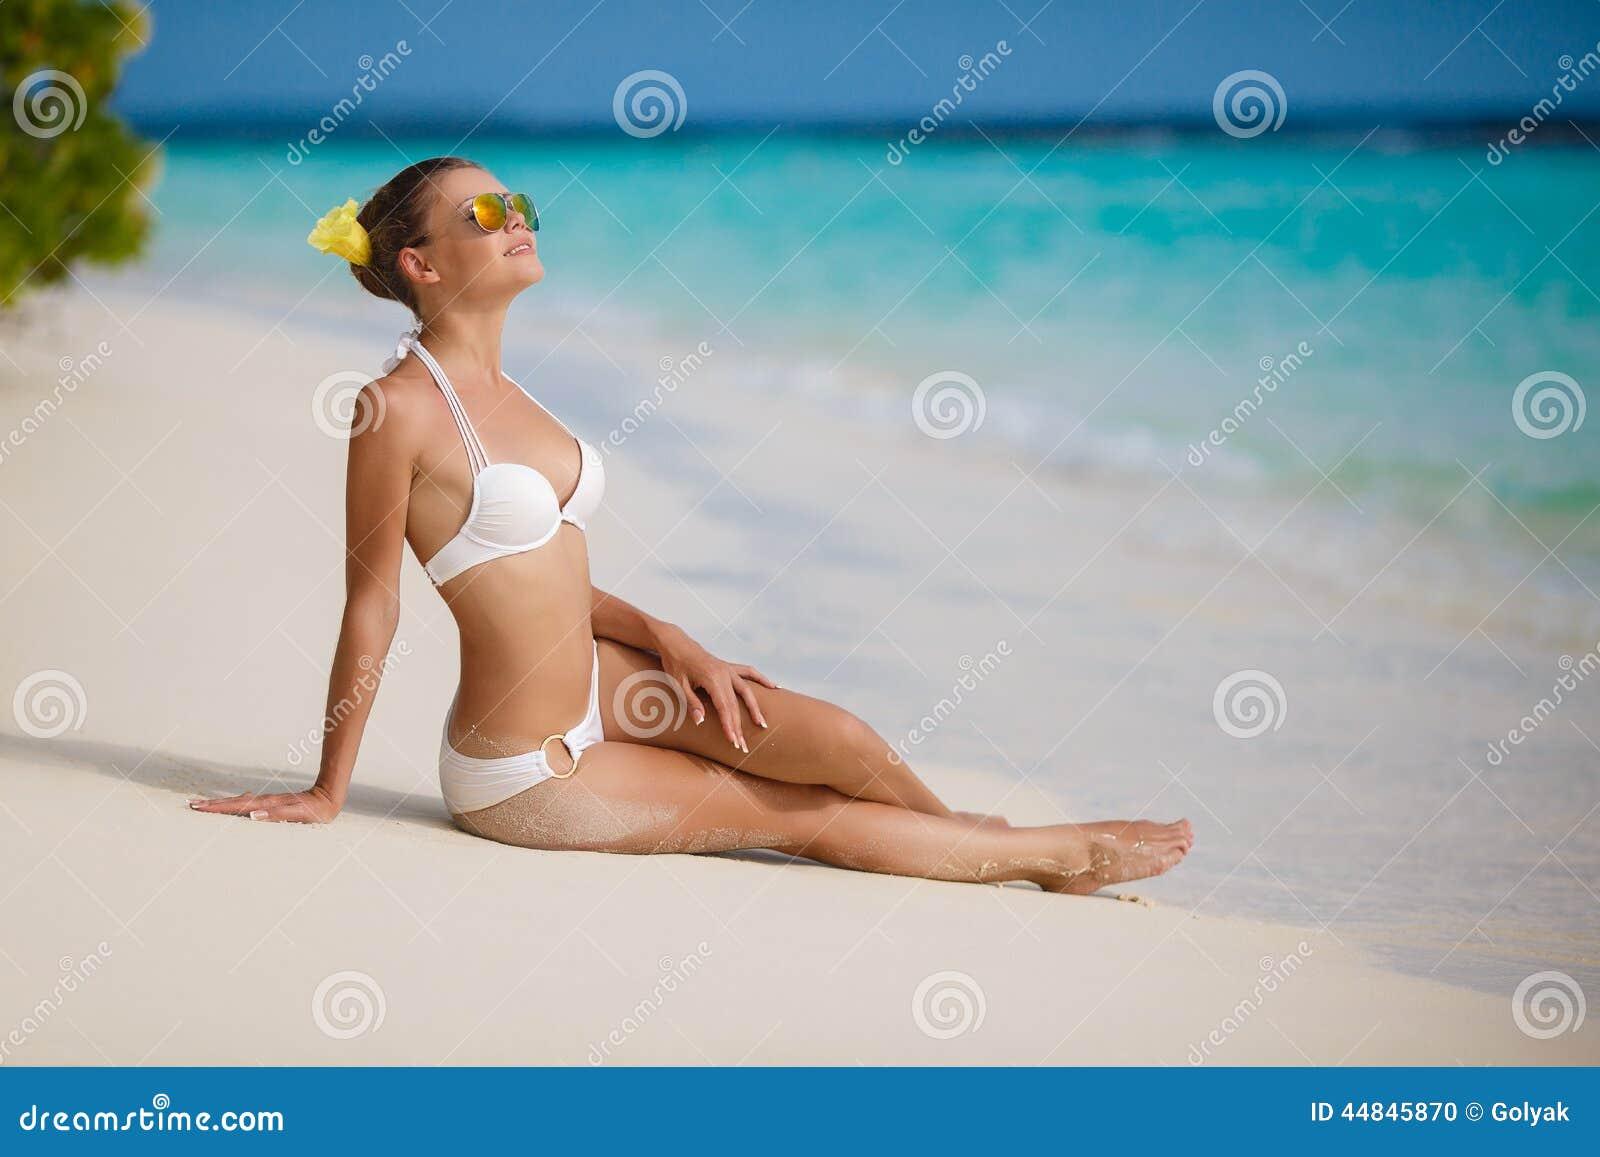 Palm Beach Tan Prices >> Woman In Bikini At Tropical Beach. Stock Photo - Image ...